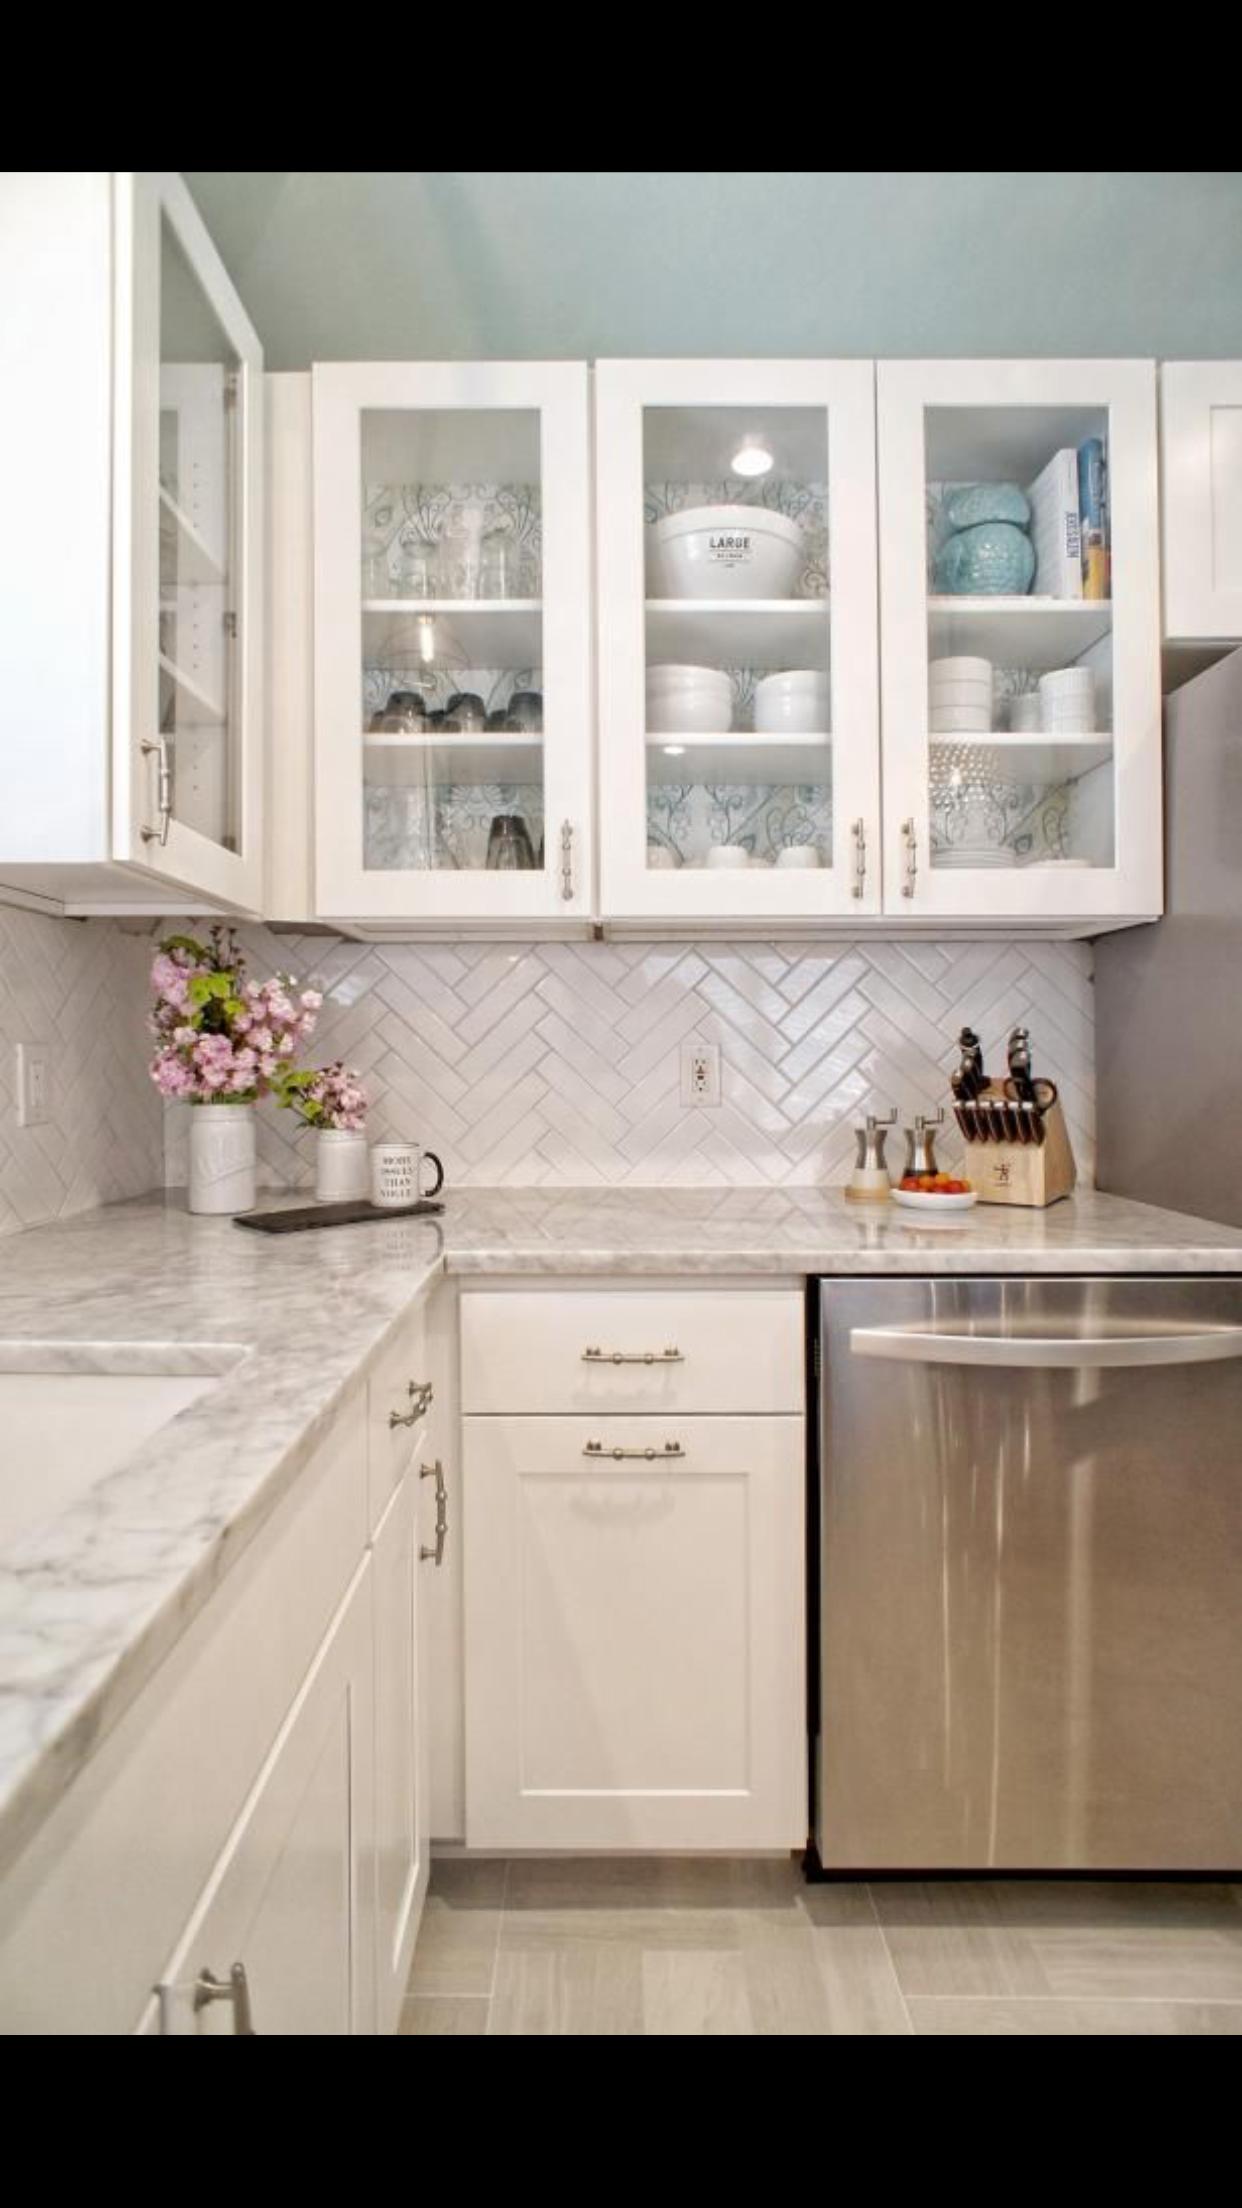 Pin by candi obando on kitchen improvements pinterest kitchens